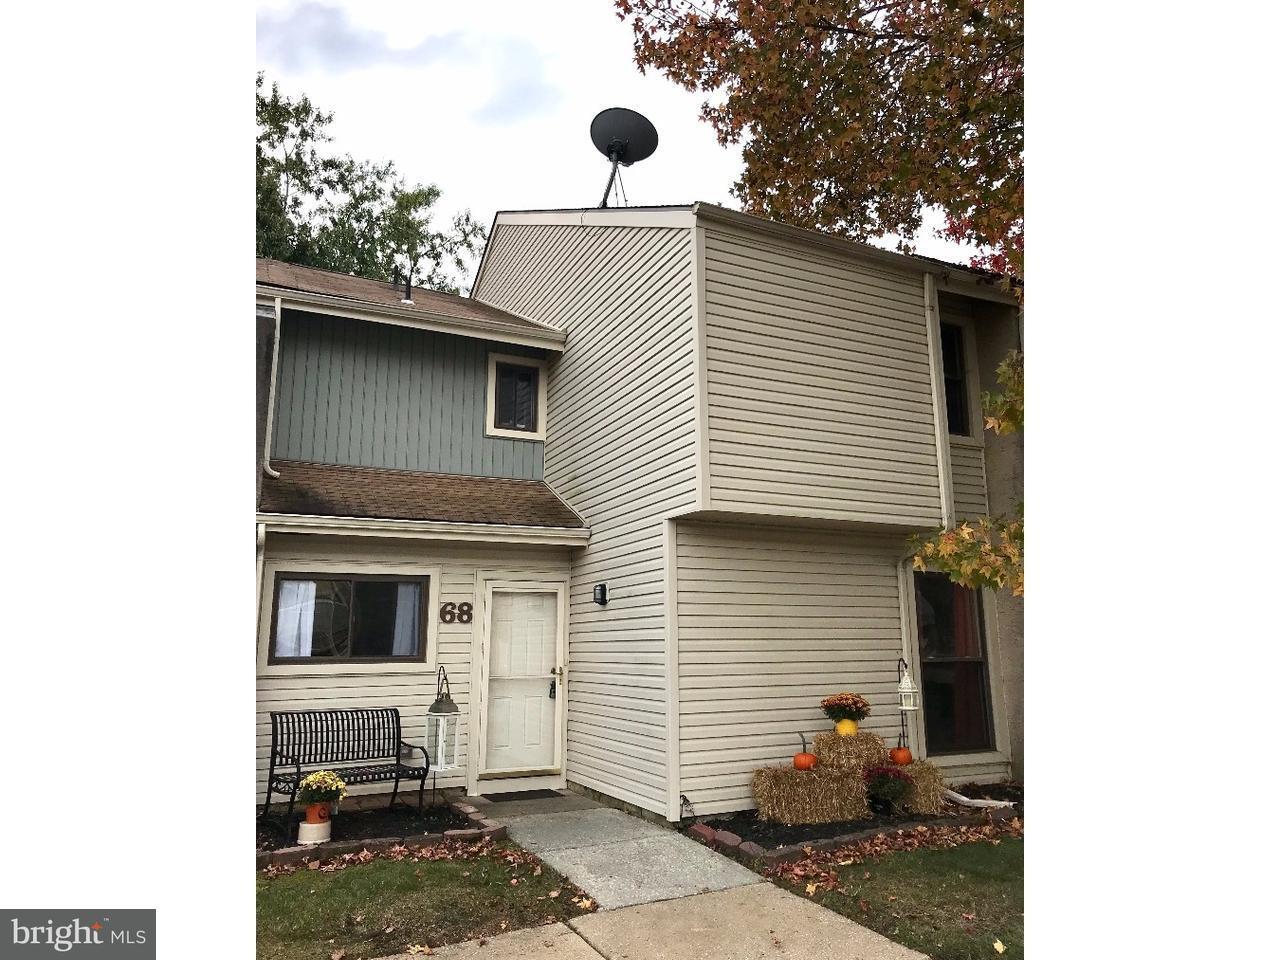 Townhouse for Sale at 68 VIBURNUM Lane Mount Laurel, New Jersey 08054 United States